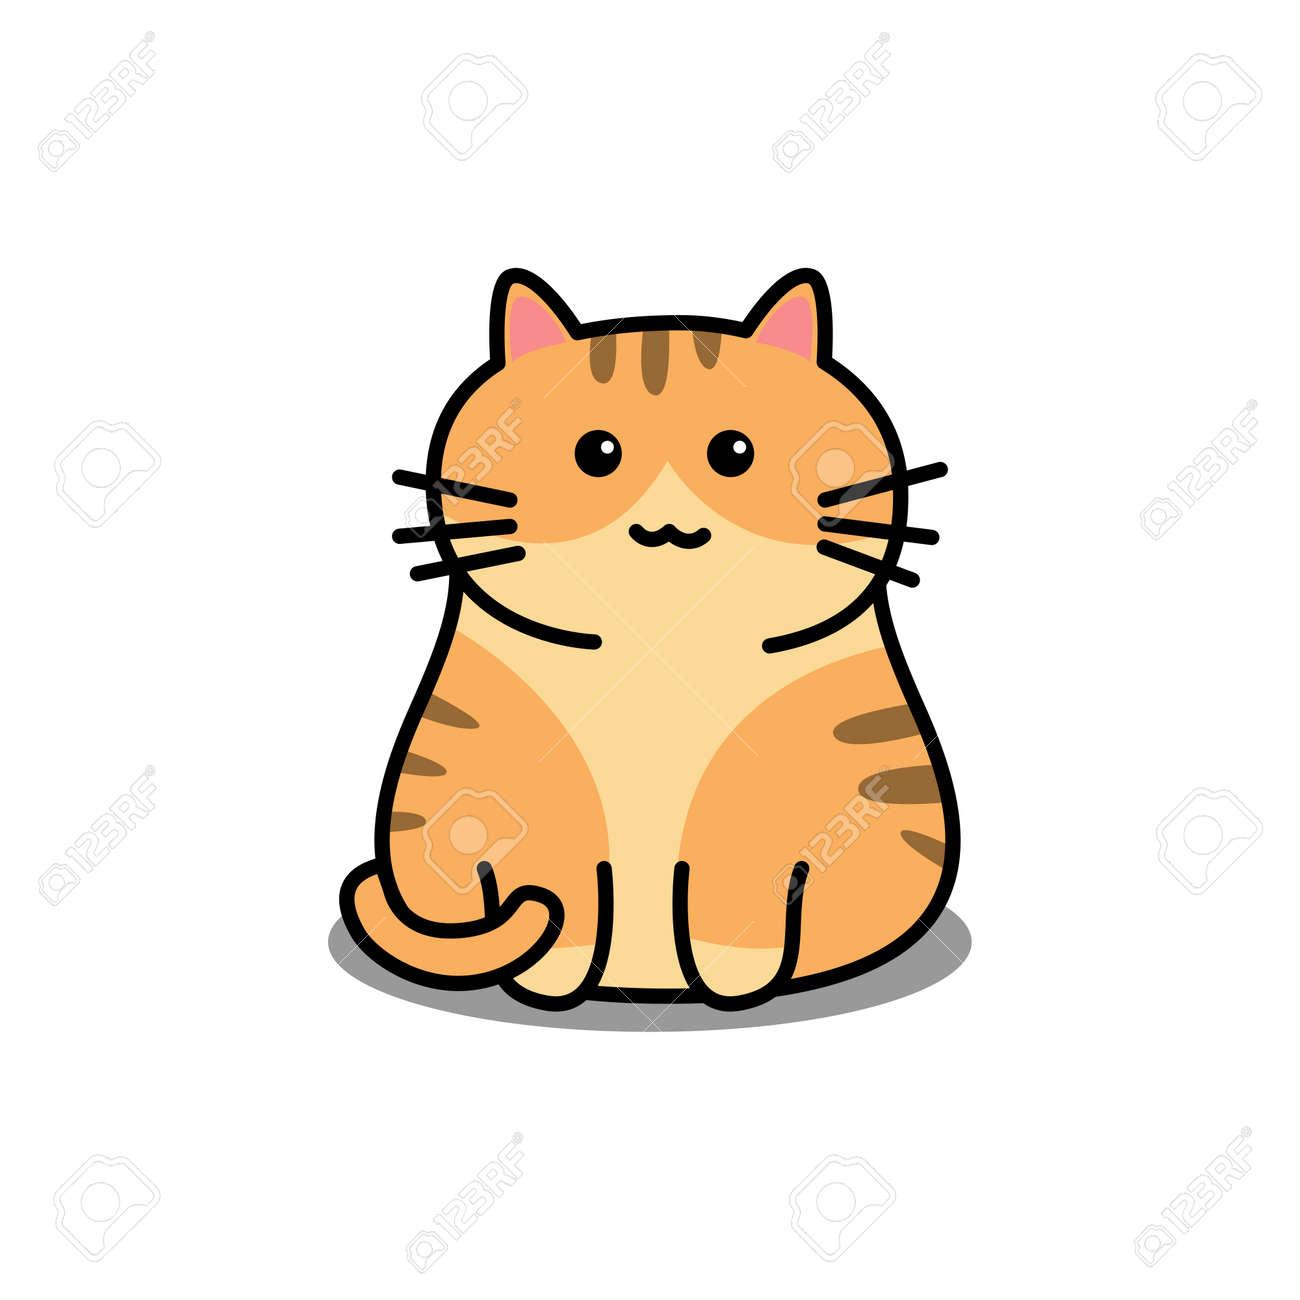 Cute orange cat cartoon, vector illustration - 169151621